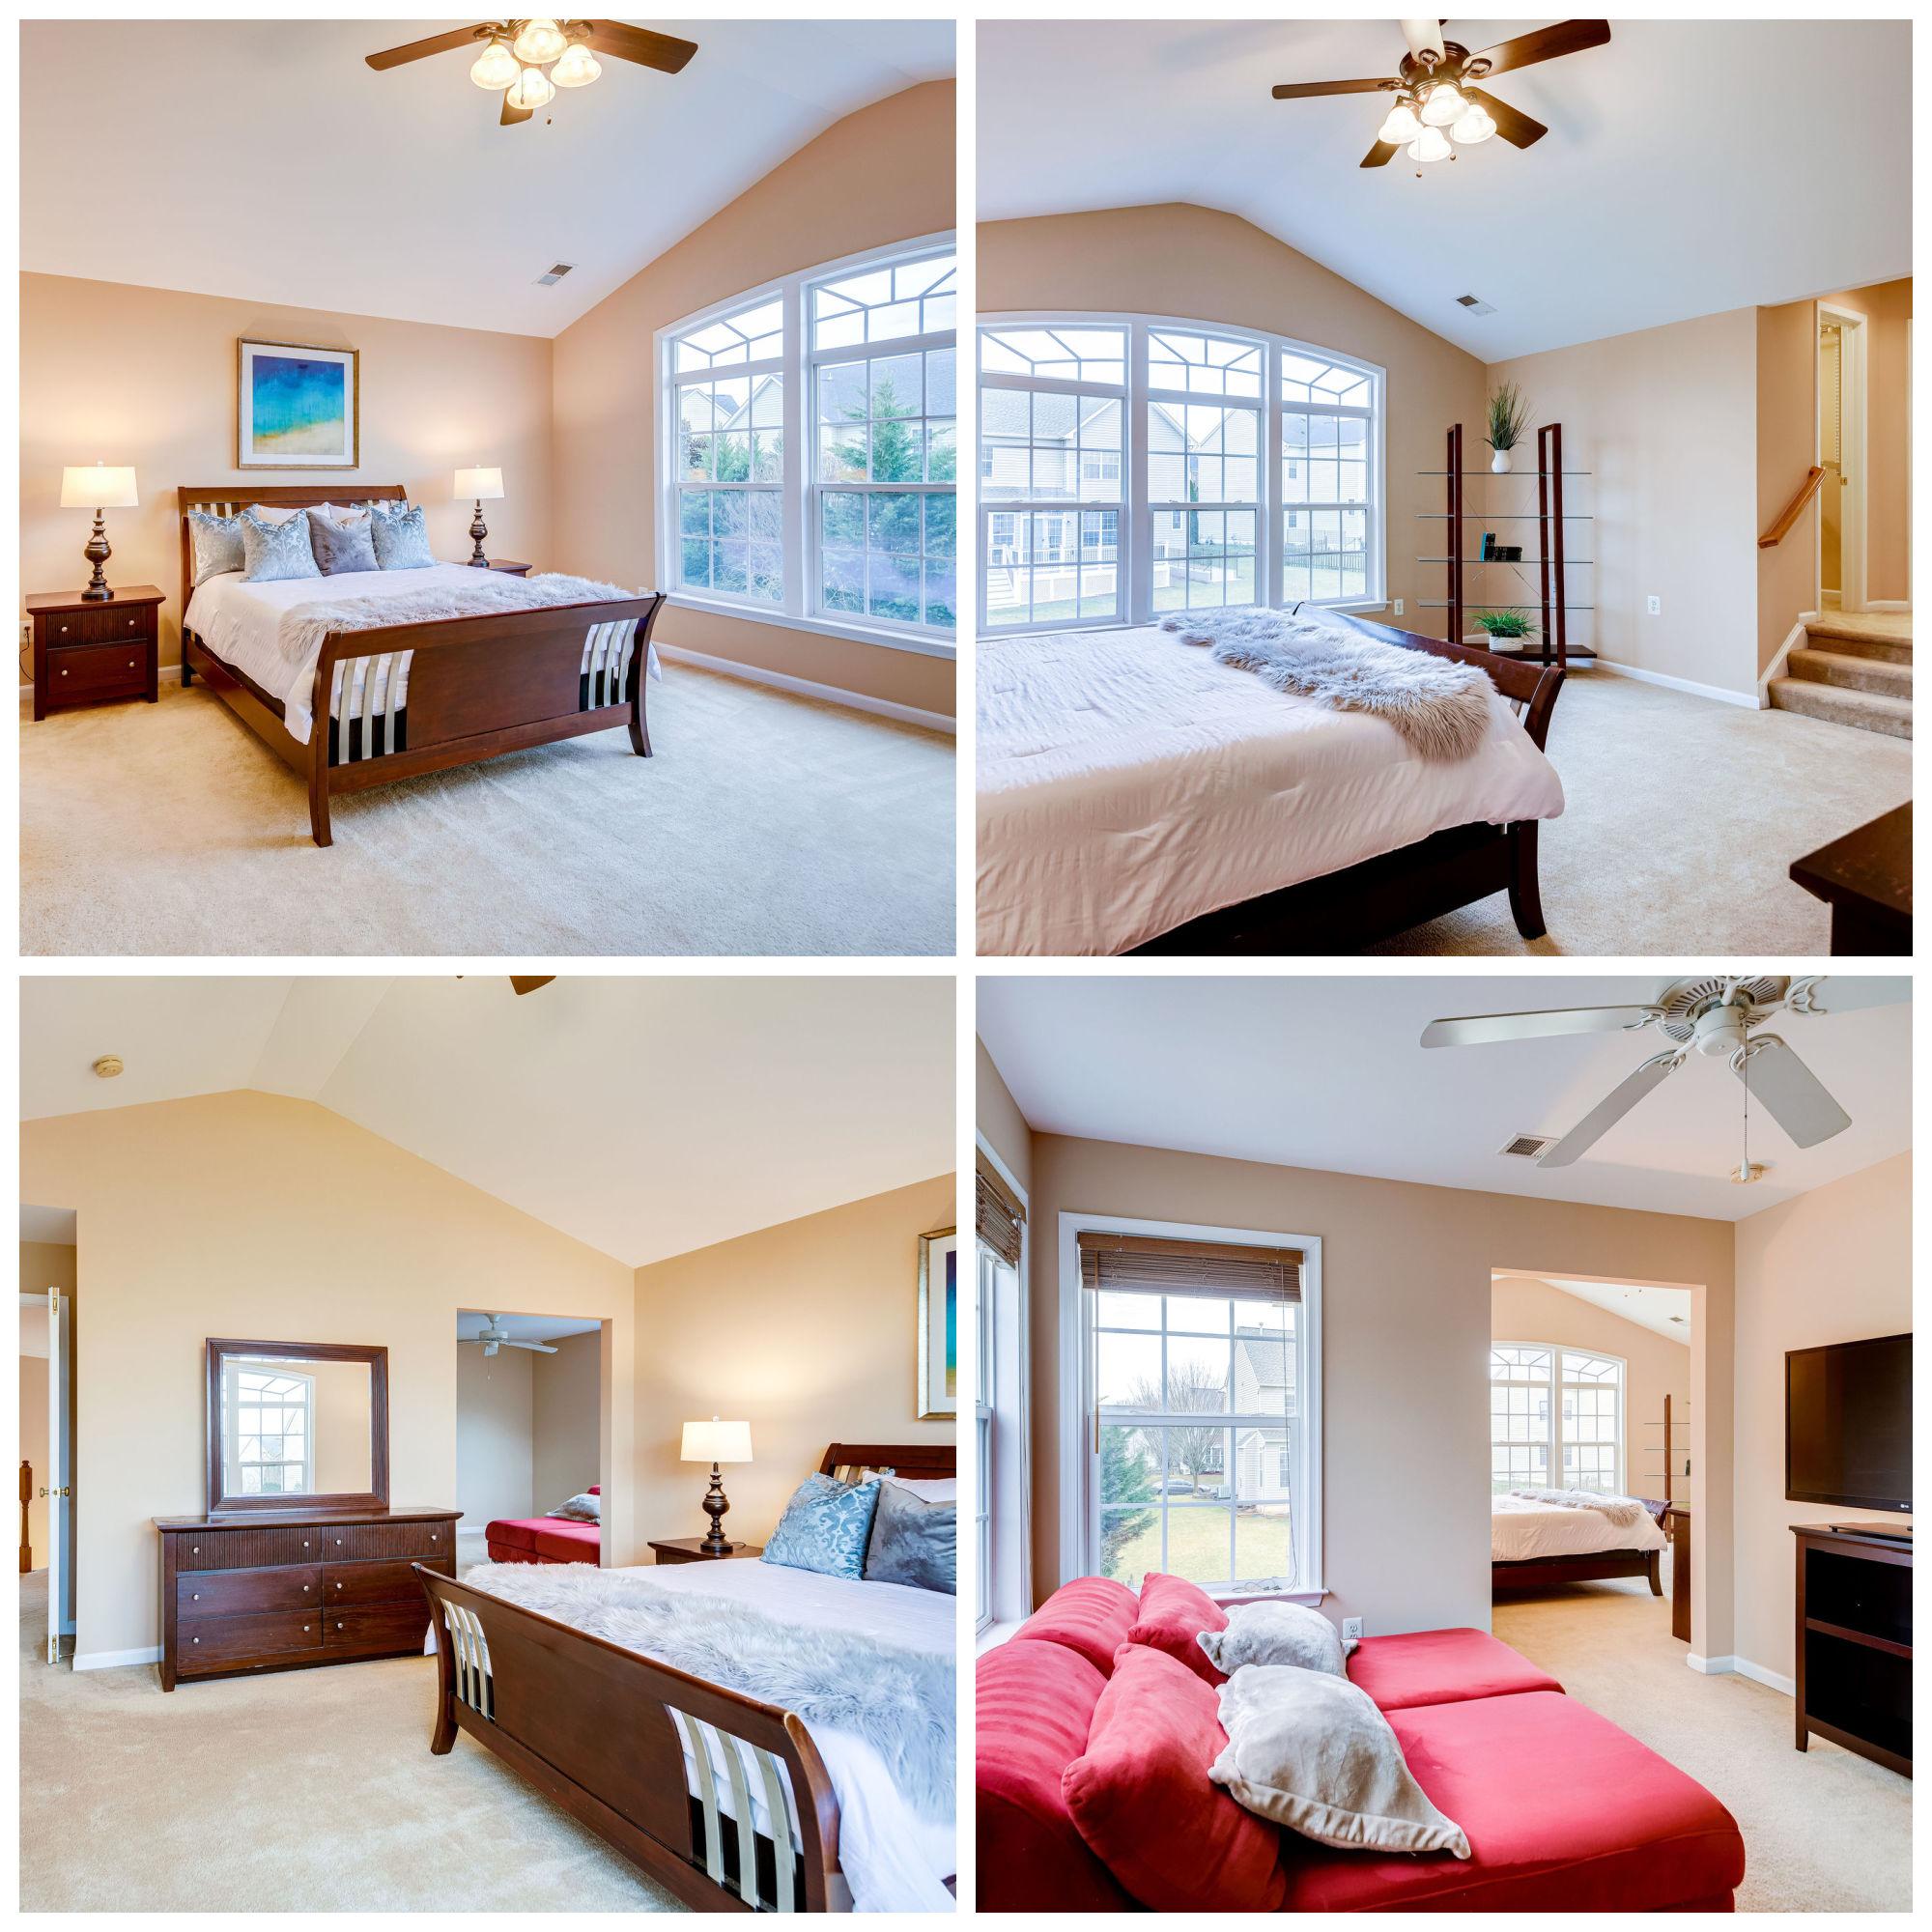 9036 Woodpecker Ct, Gainesville- Primary Suite